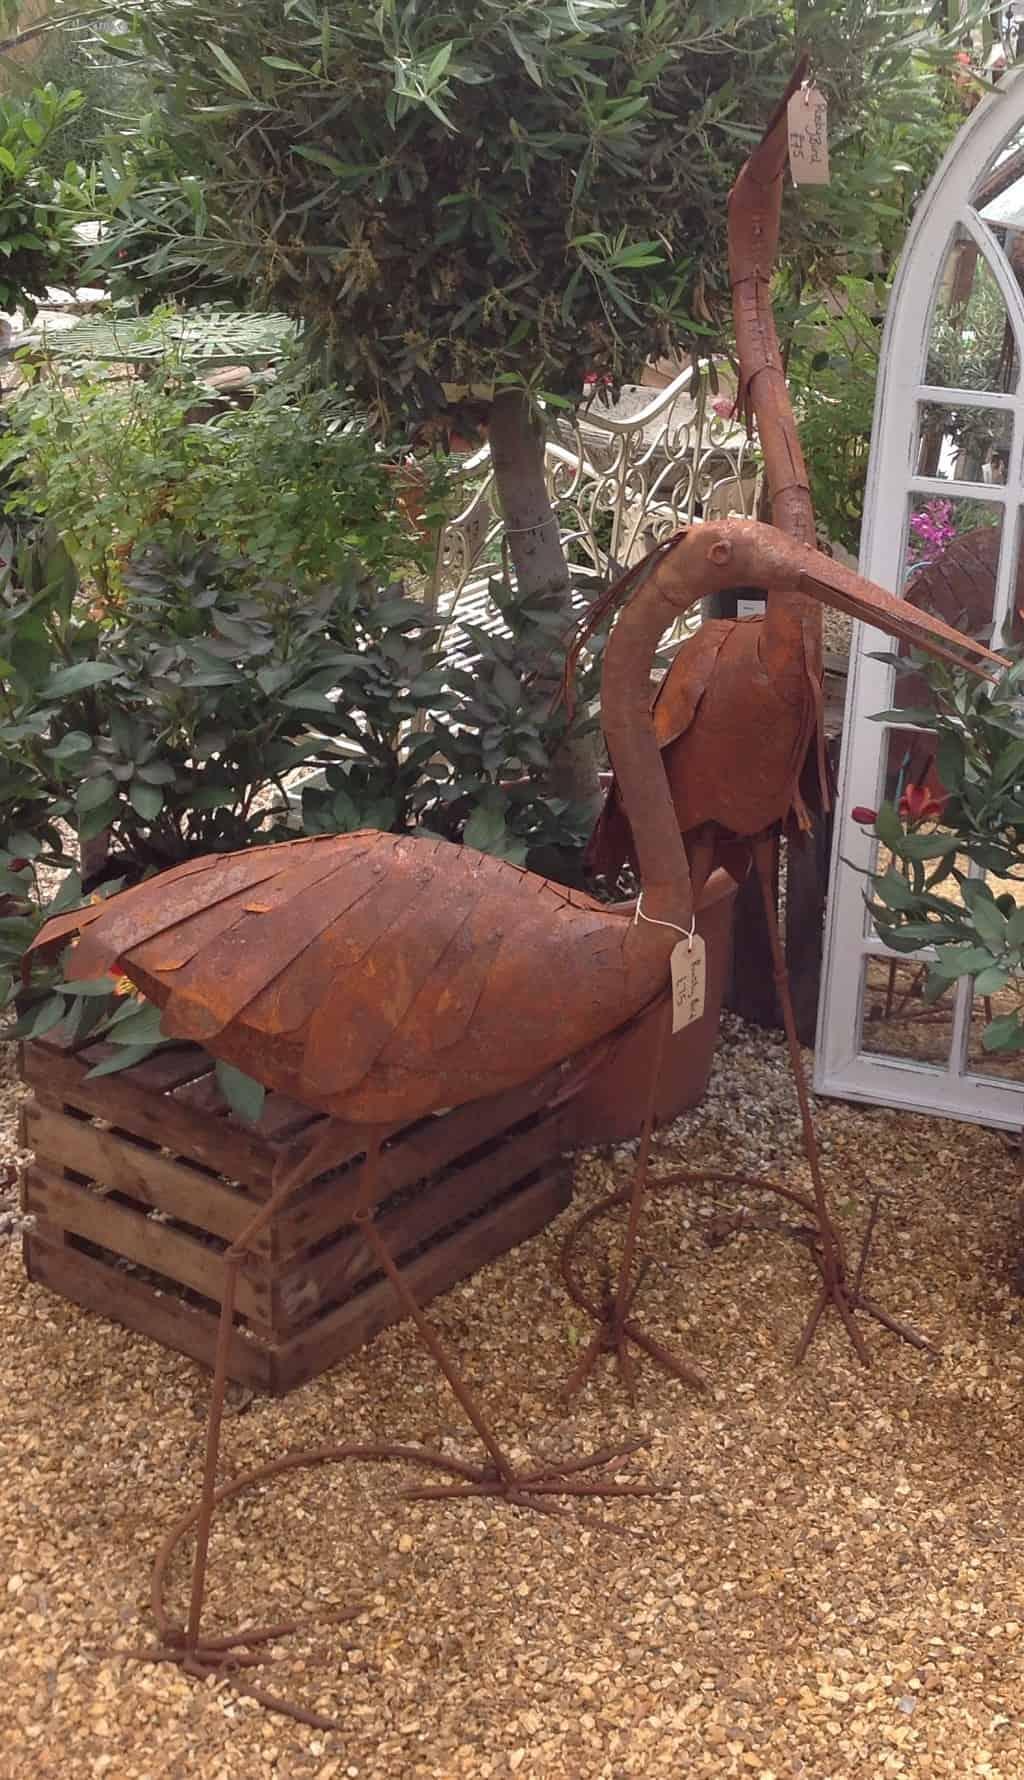 At Home Garden Ridge Store Hours | Home & Garden